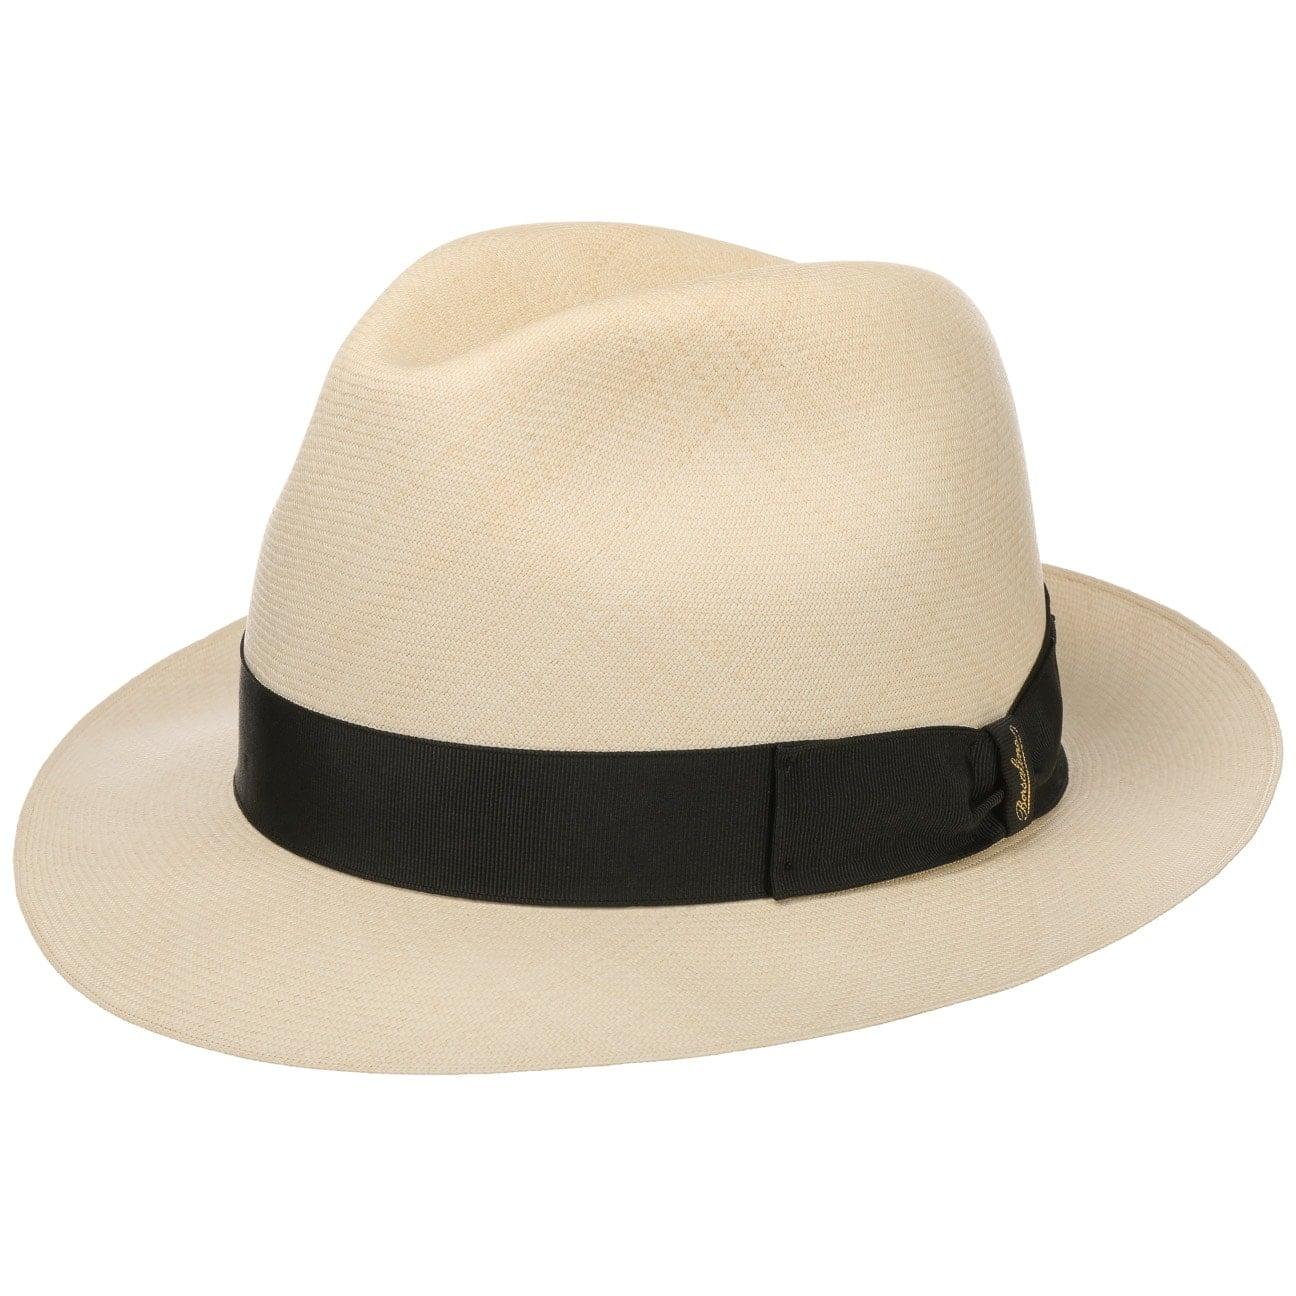 Sombrero Bogart Panam? Prestige Borsalino  sombrero de verano